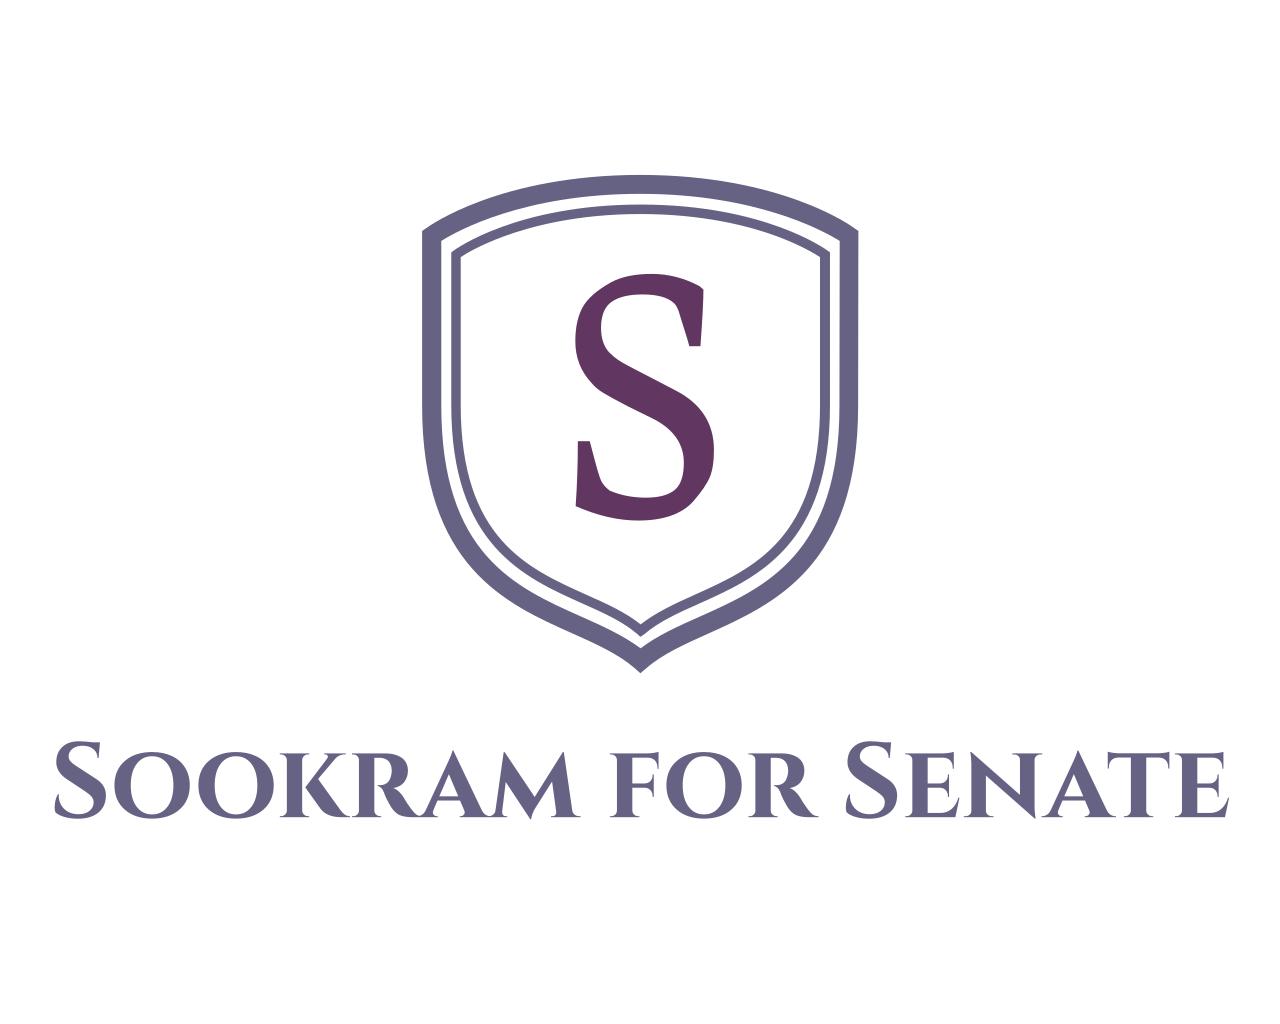 Sookram for Senate